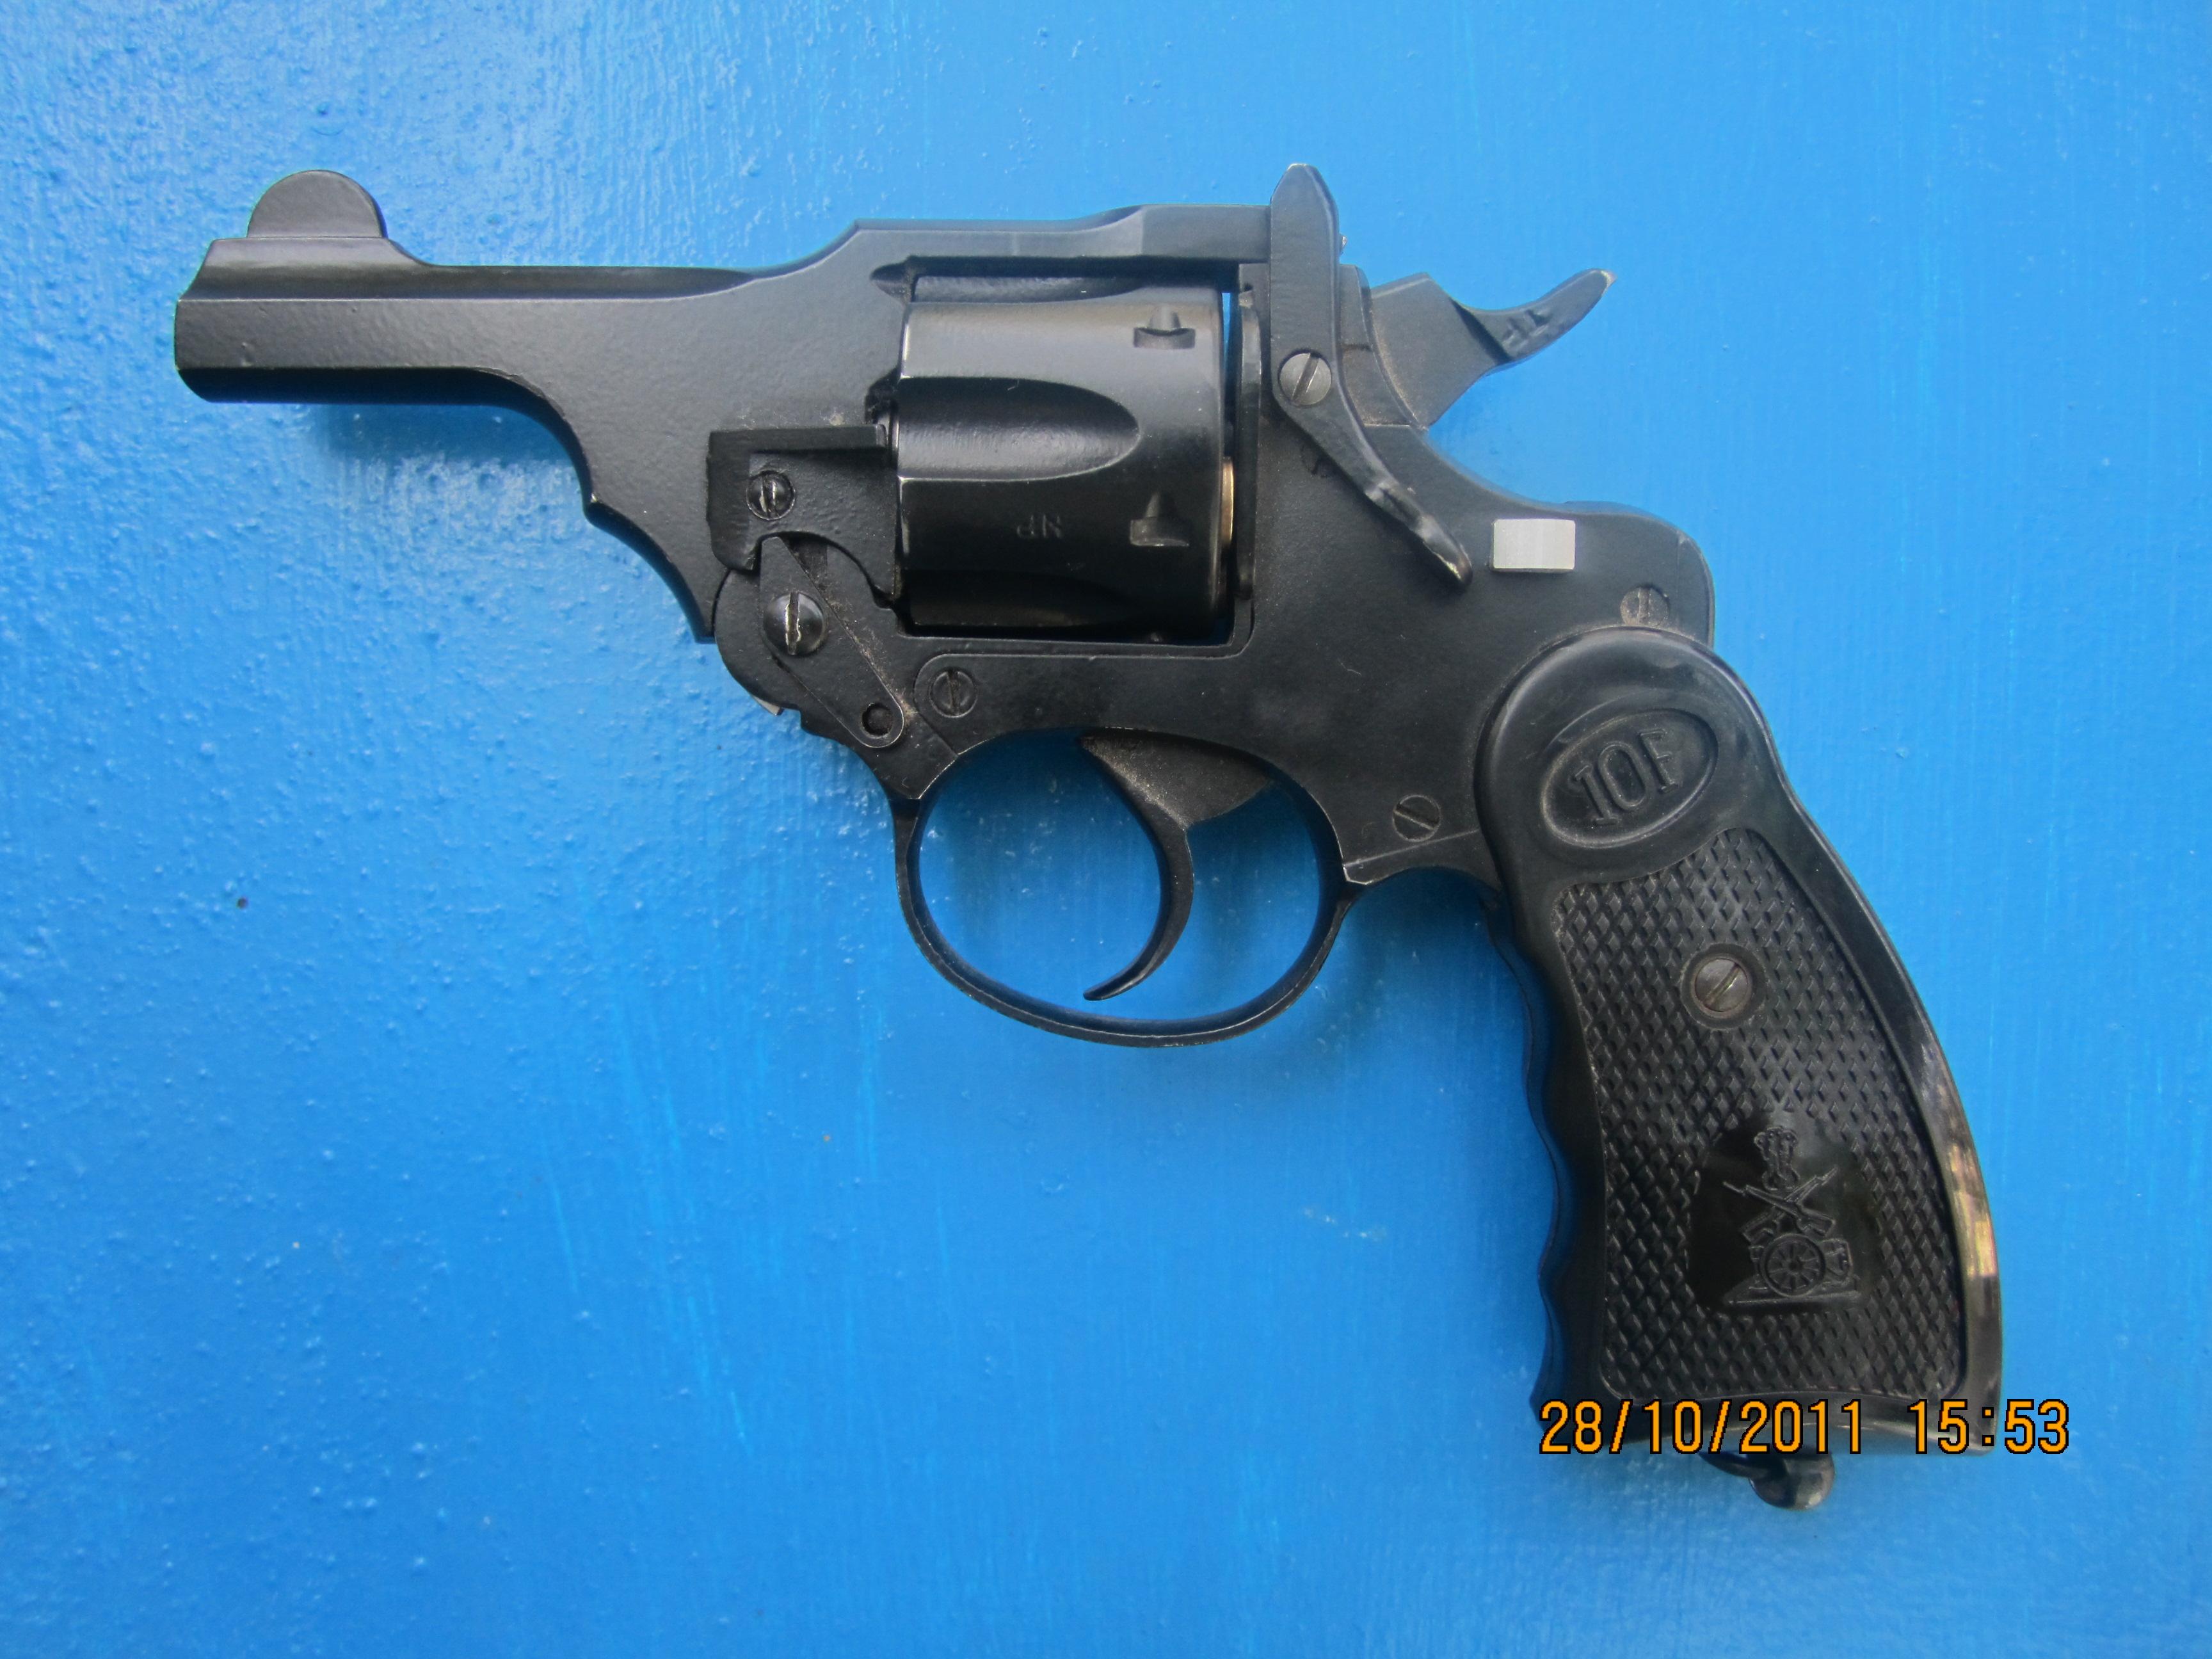 Pistol License For Home Defense Nassau County